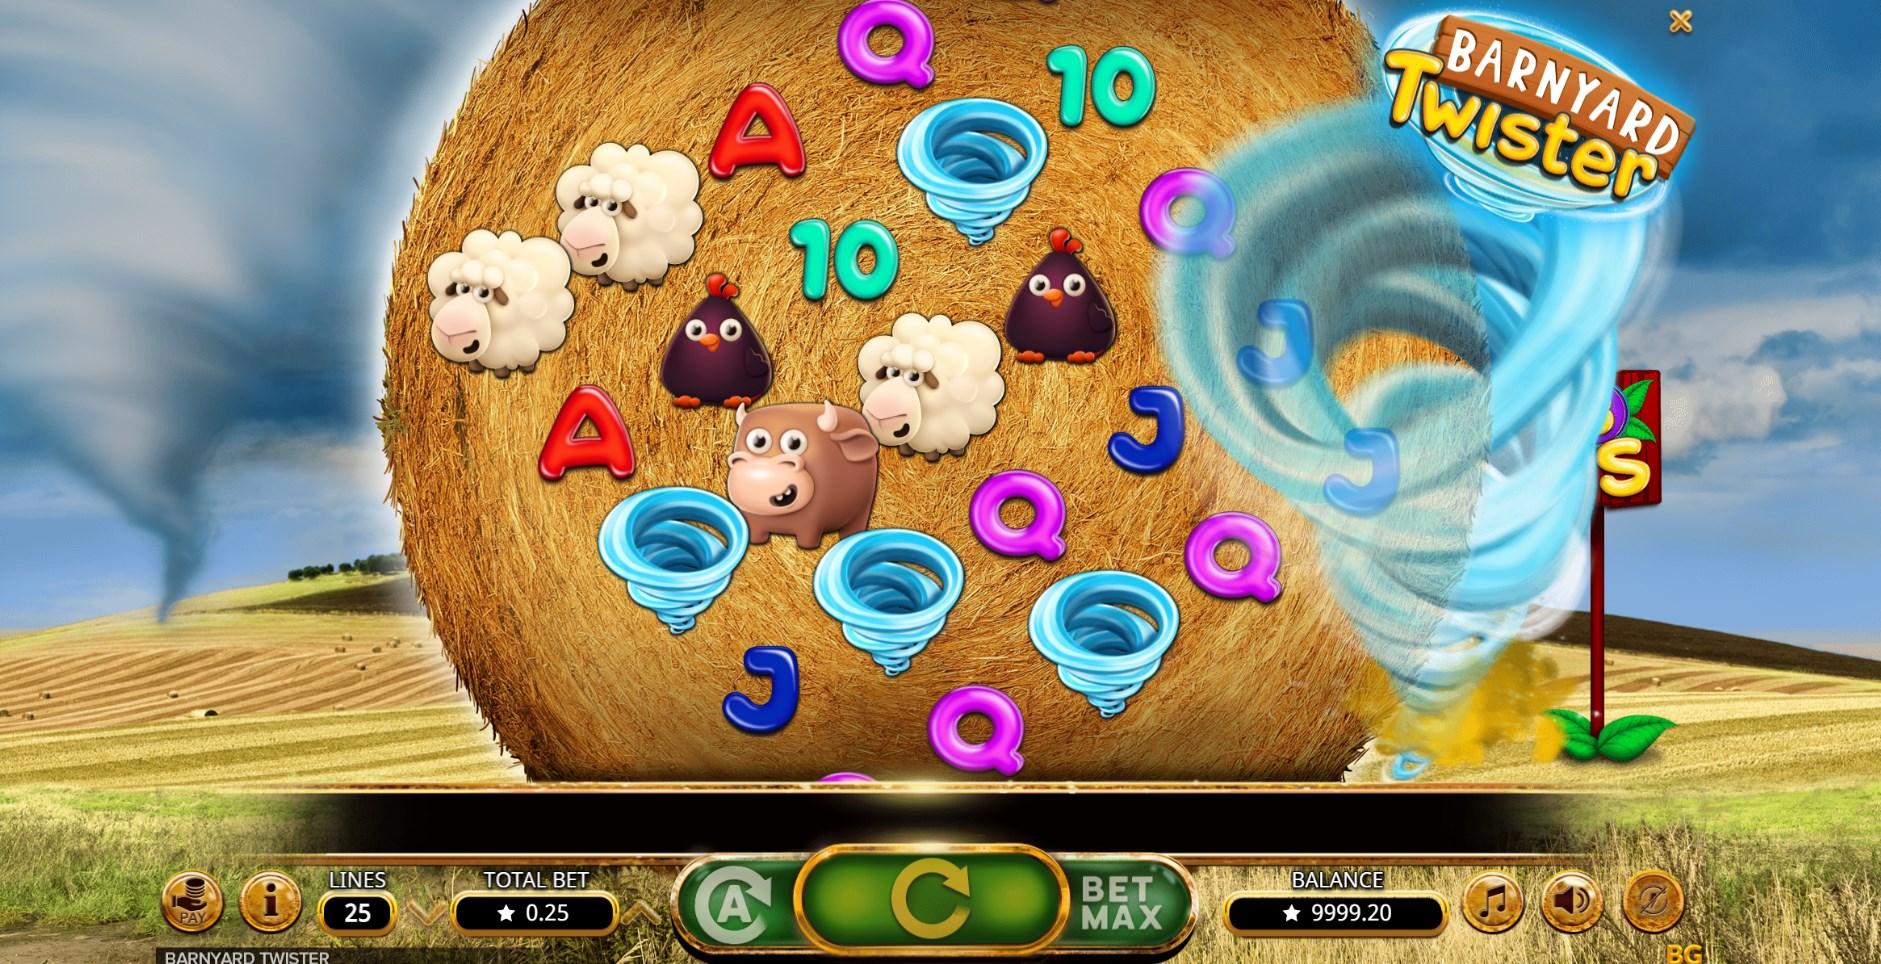 Barnyard Twister play for free